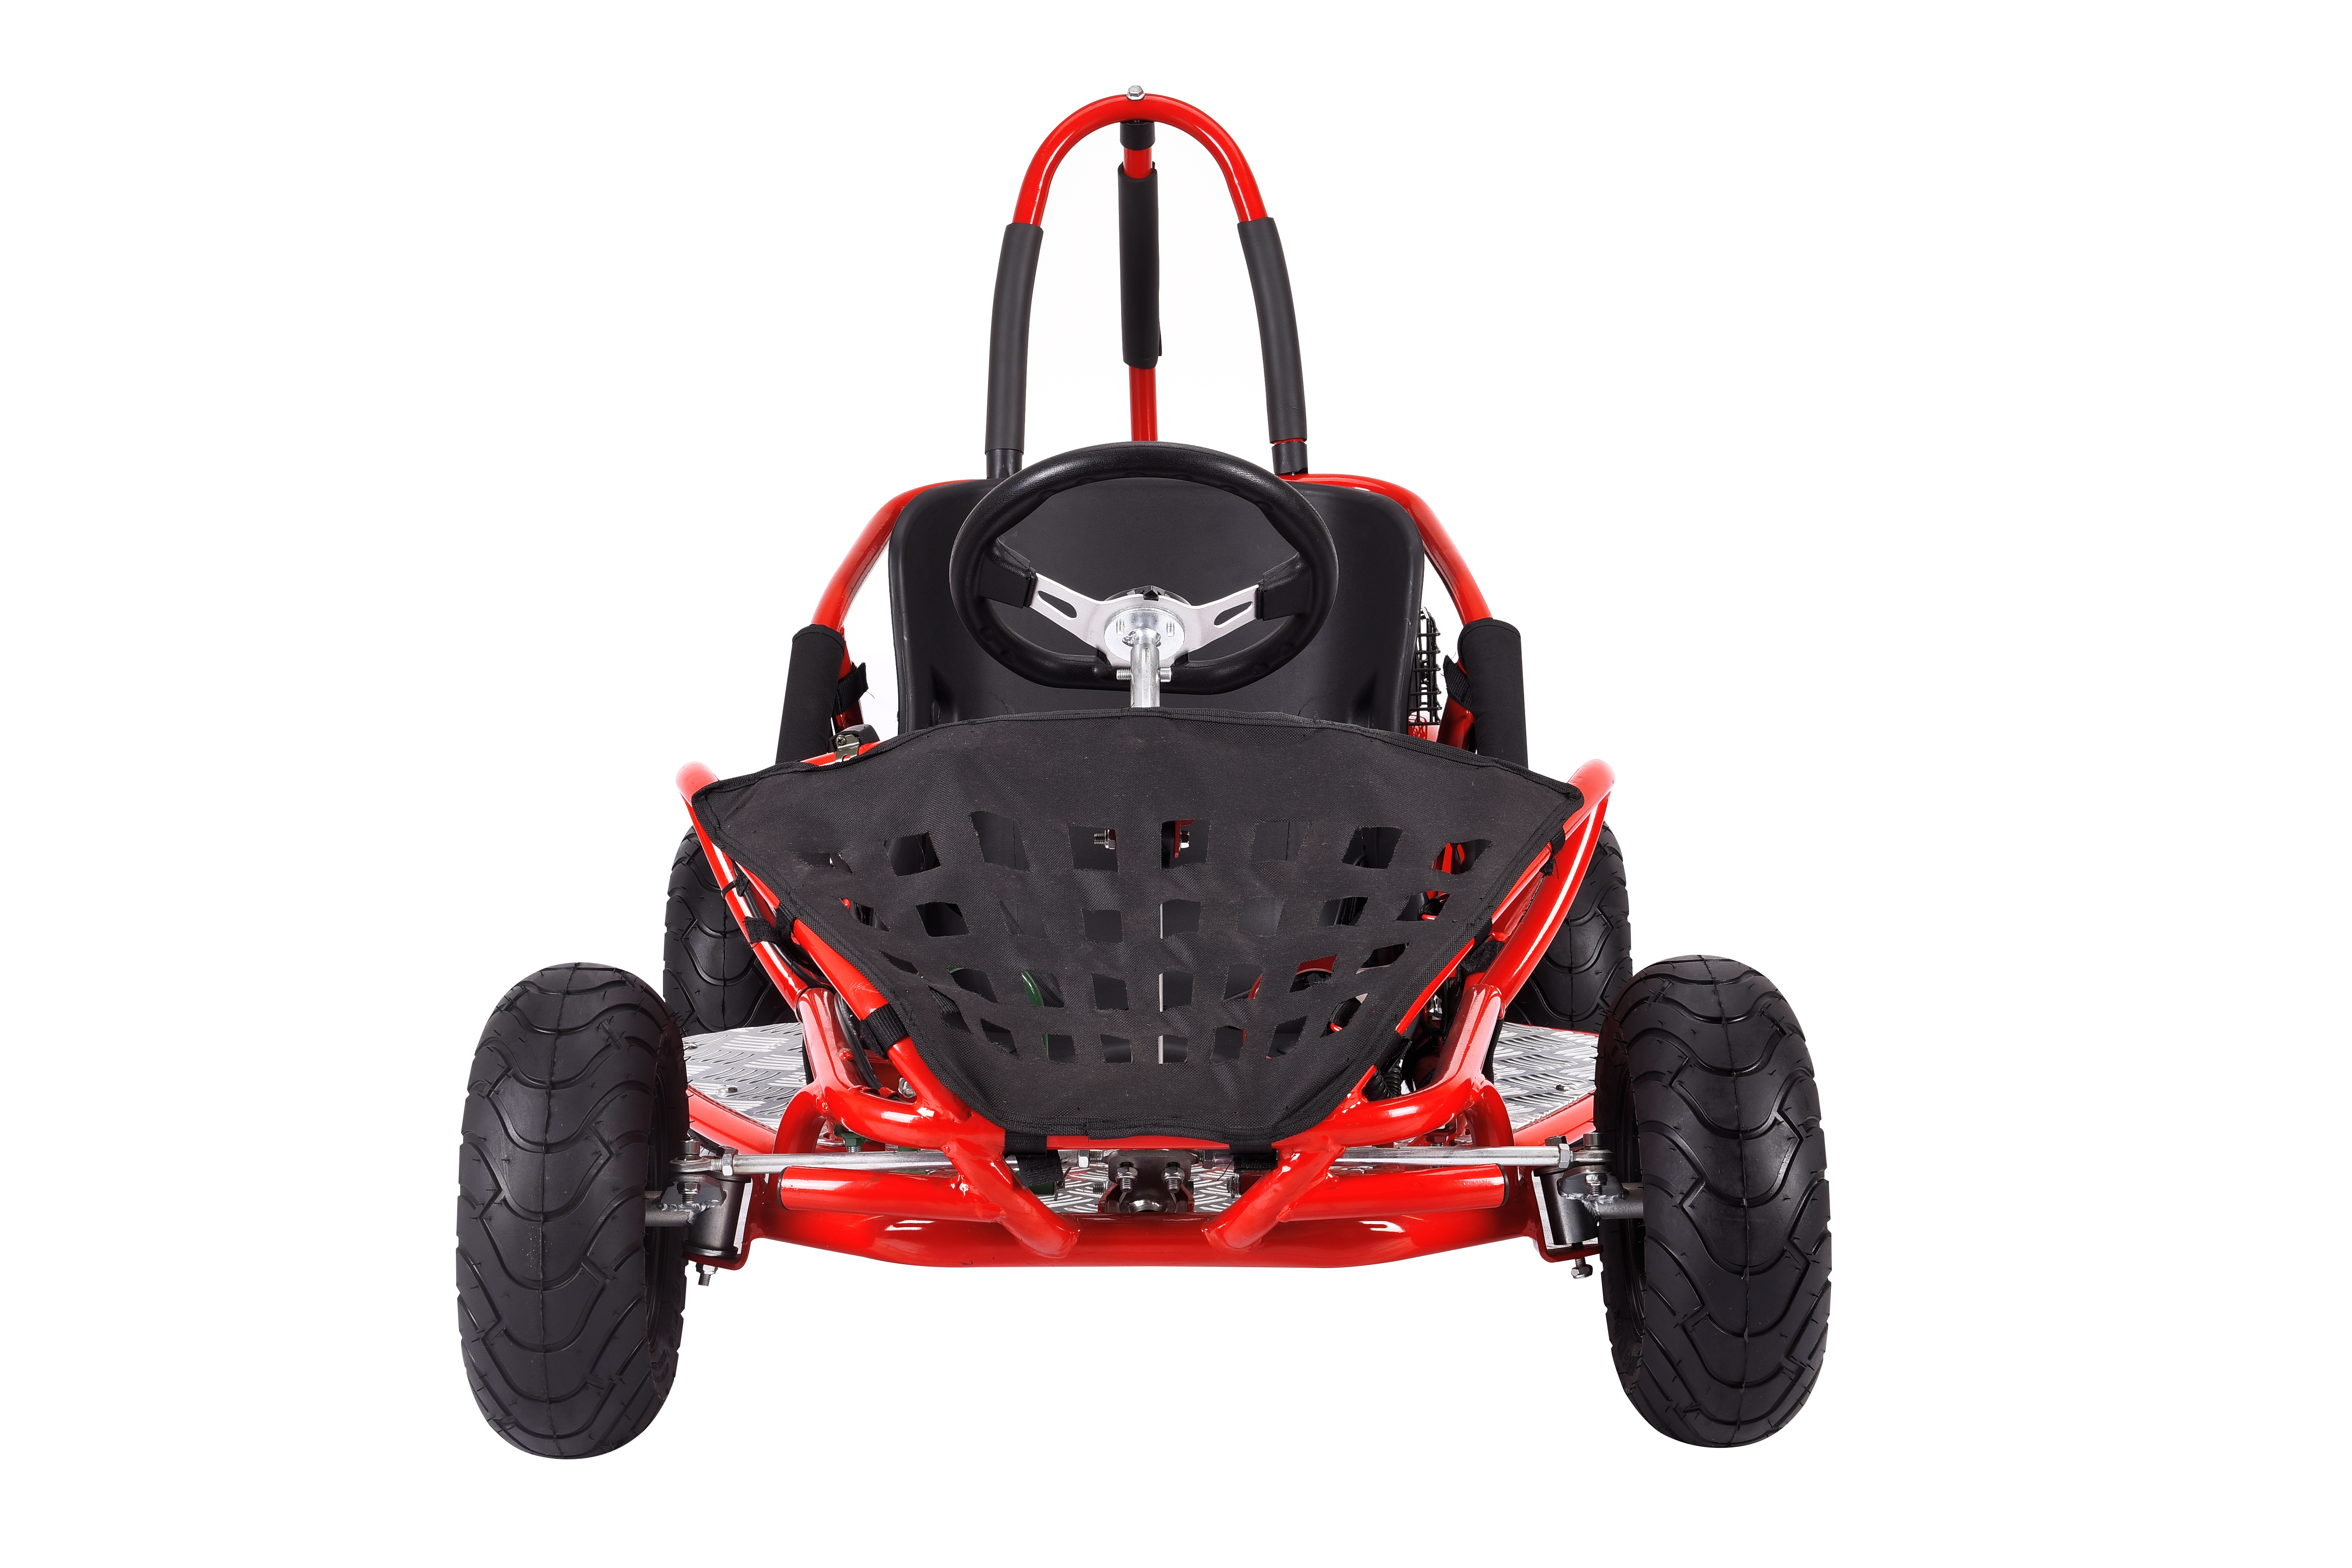 79cc Off Road Gas Go Kart Mini Quad Red Amp Black